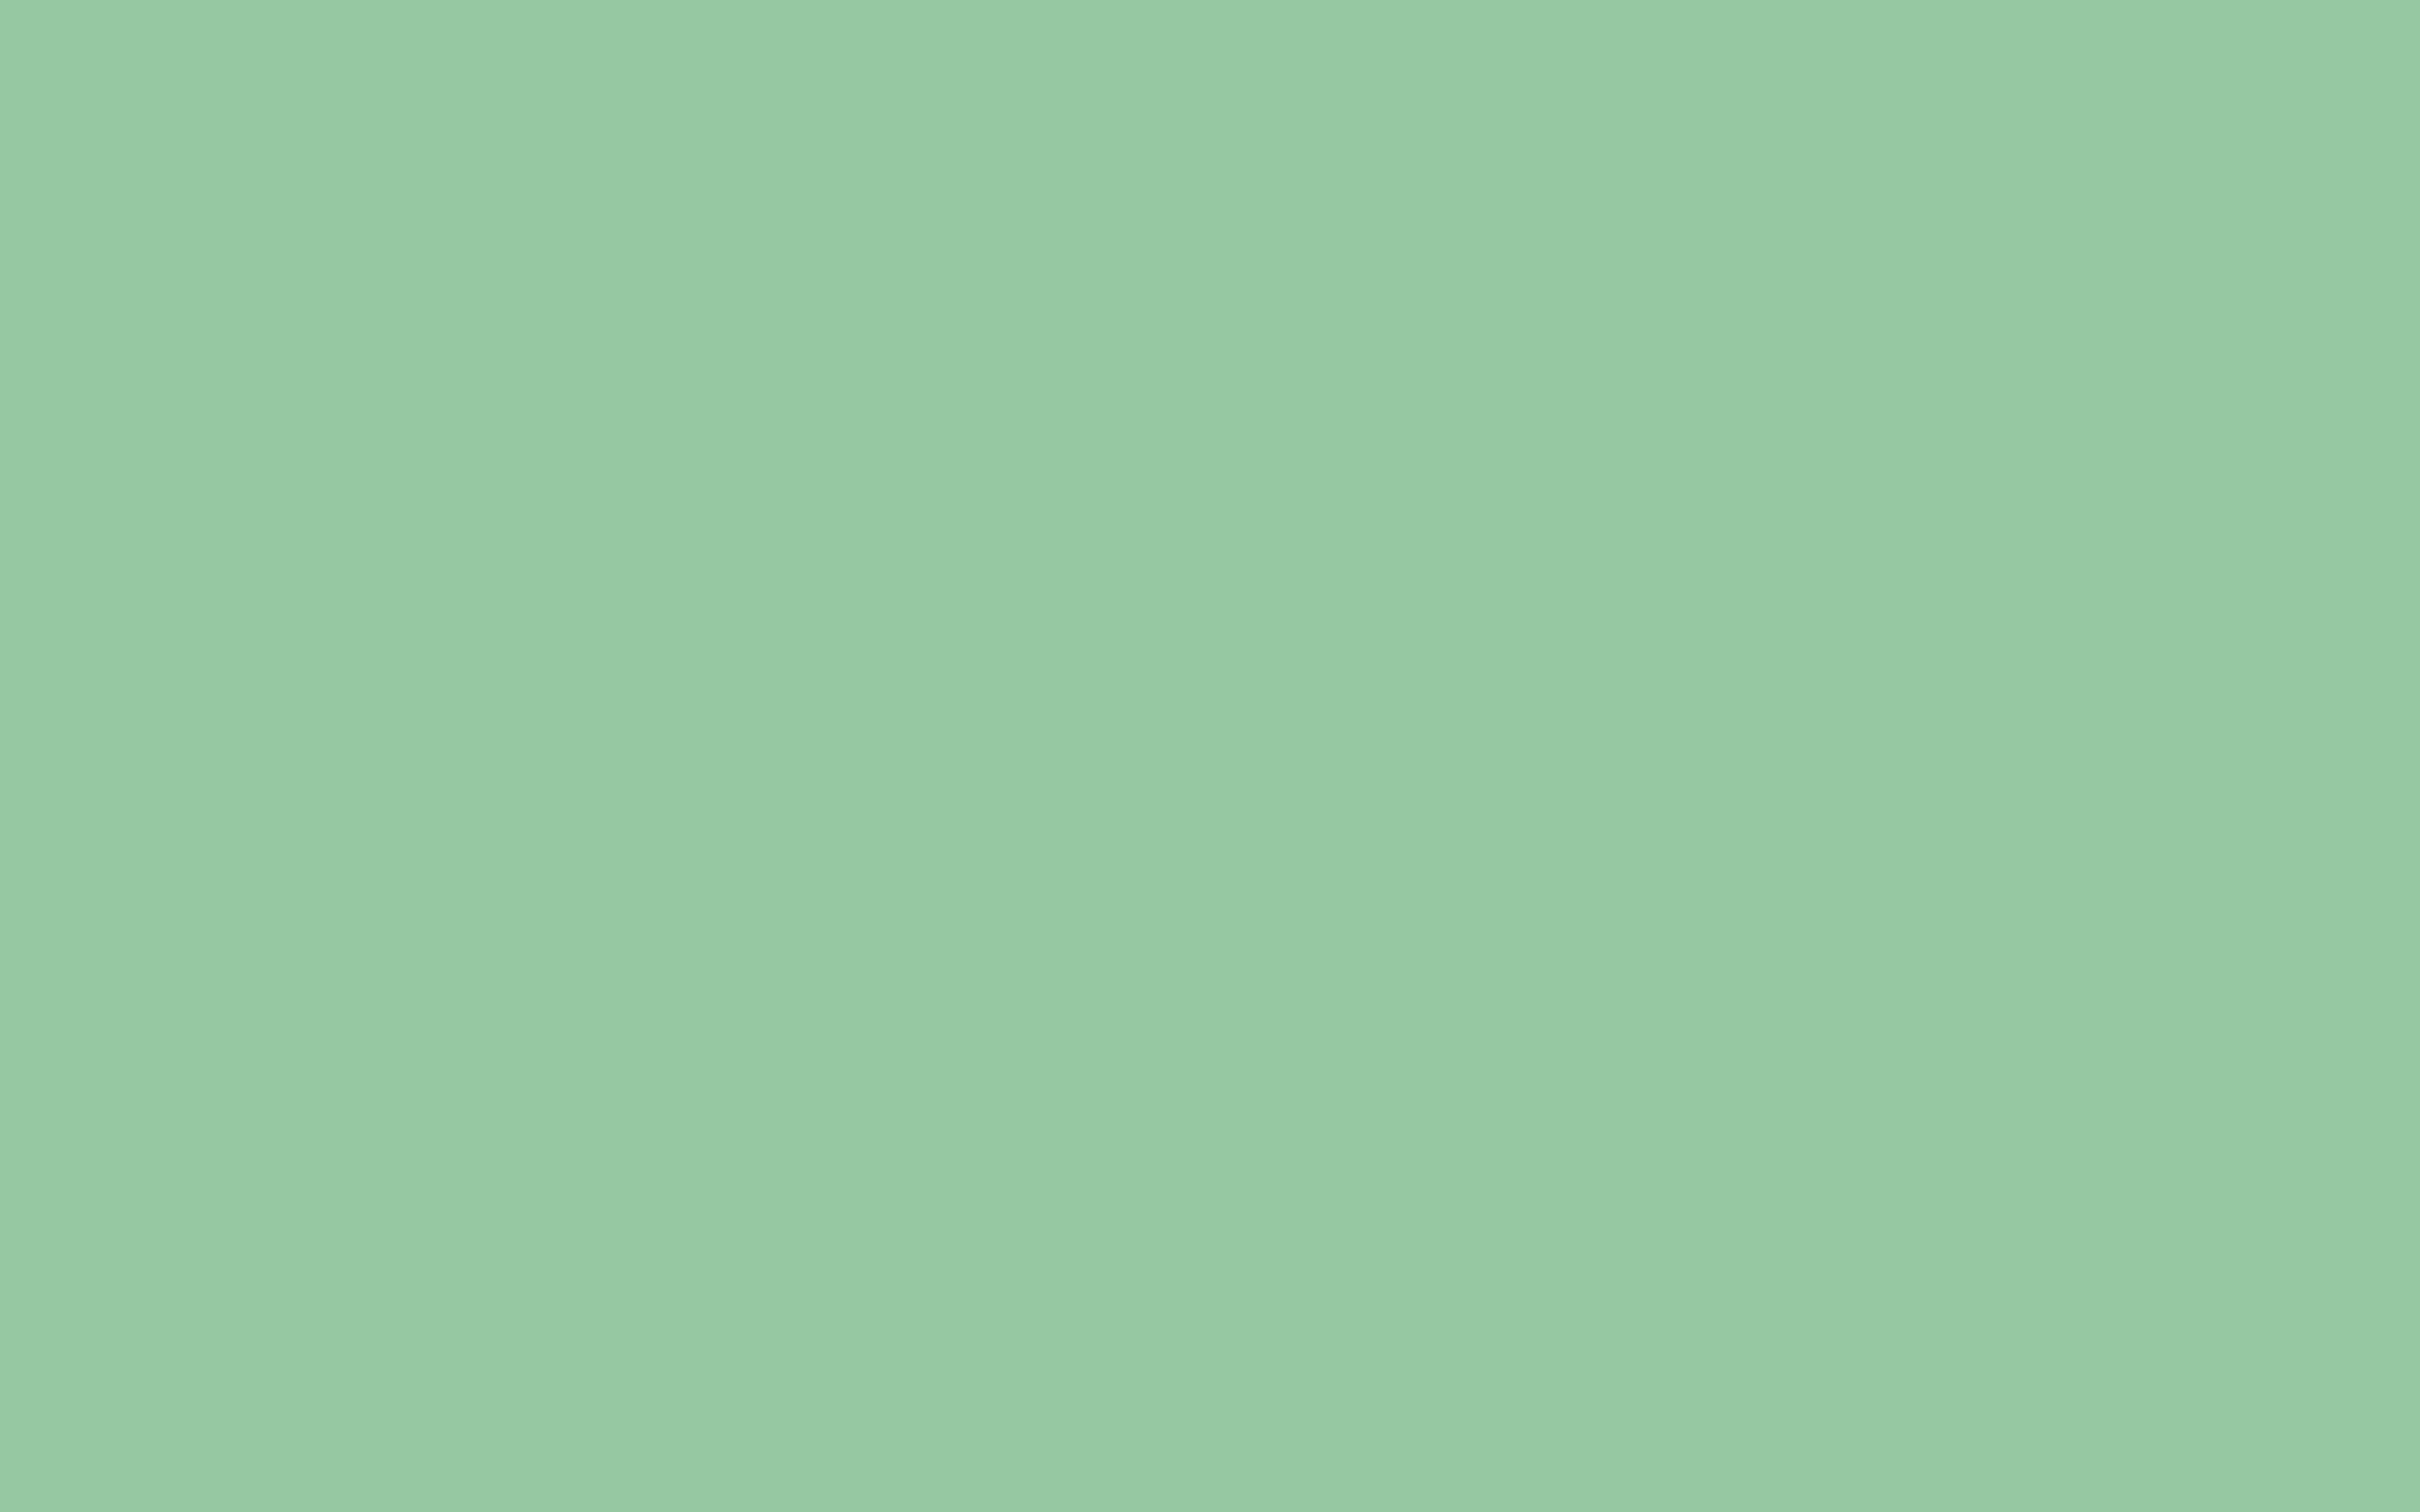 2560x1600 Eton Blue Solid Color Background